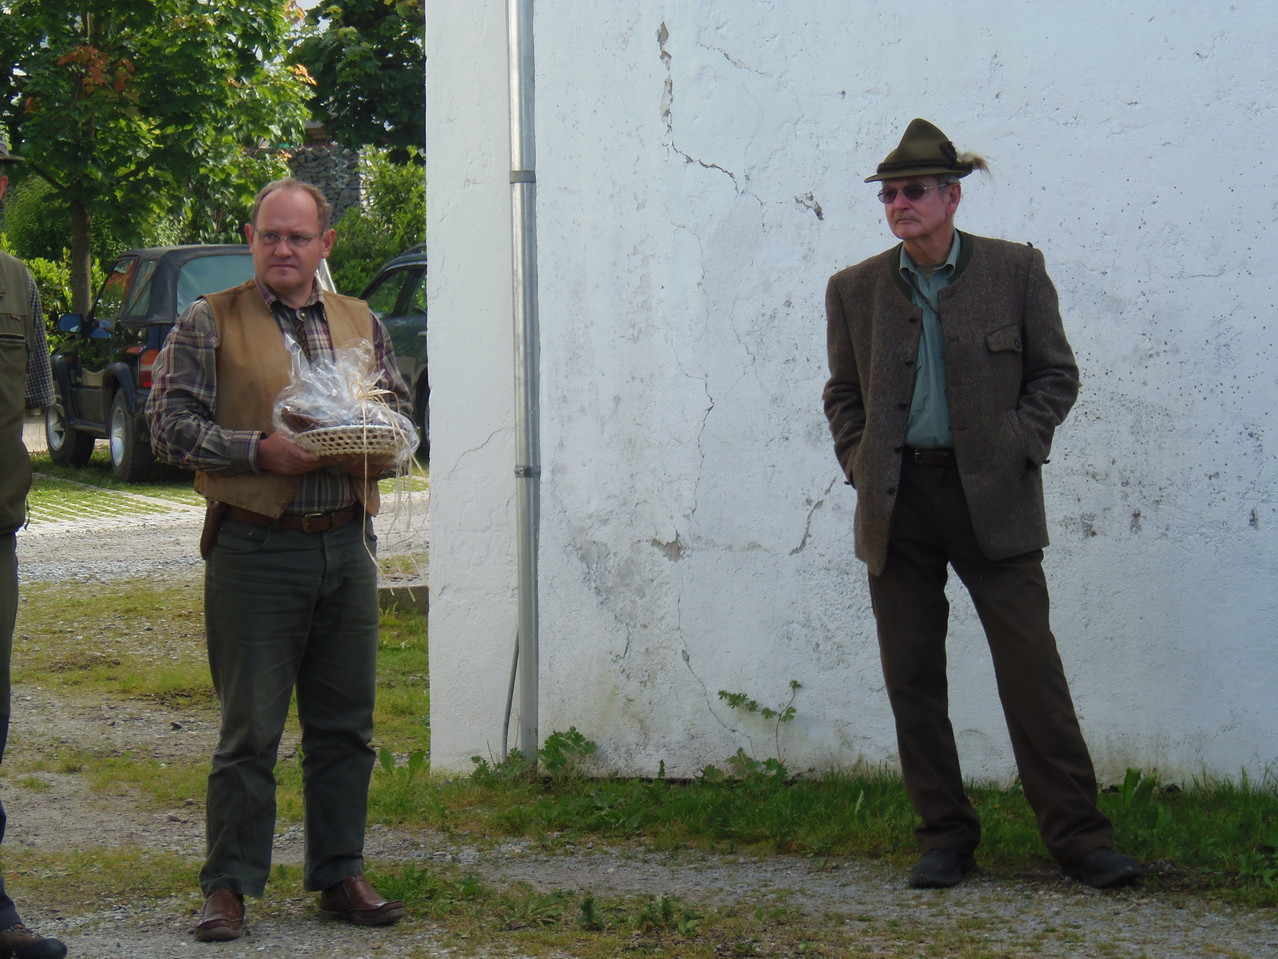 Jagdleiter Erhart Martin und Leistungsrichter Dr. Robert Kaserer